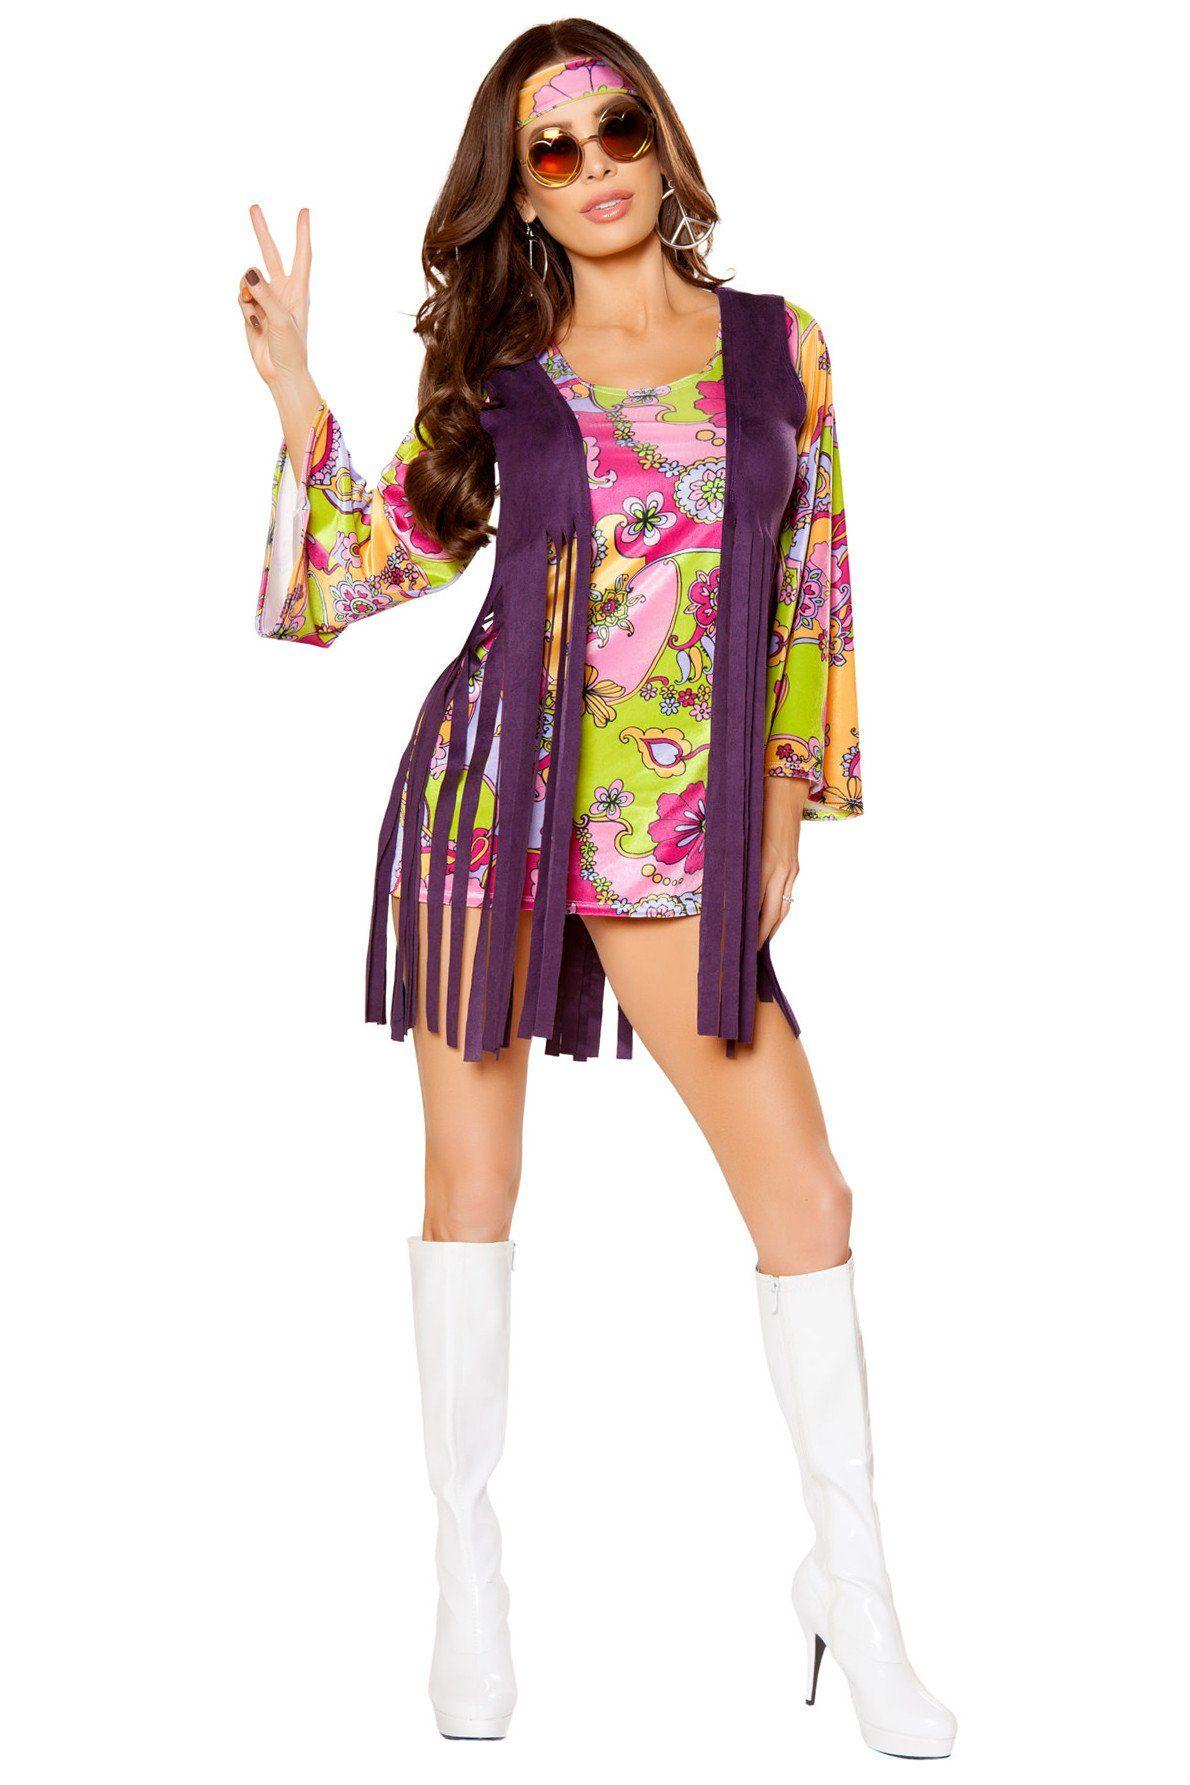 Hippie Girl Halloween Costume.Hippie Girl Costumes Hippie Costume New Halloween Costumes